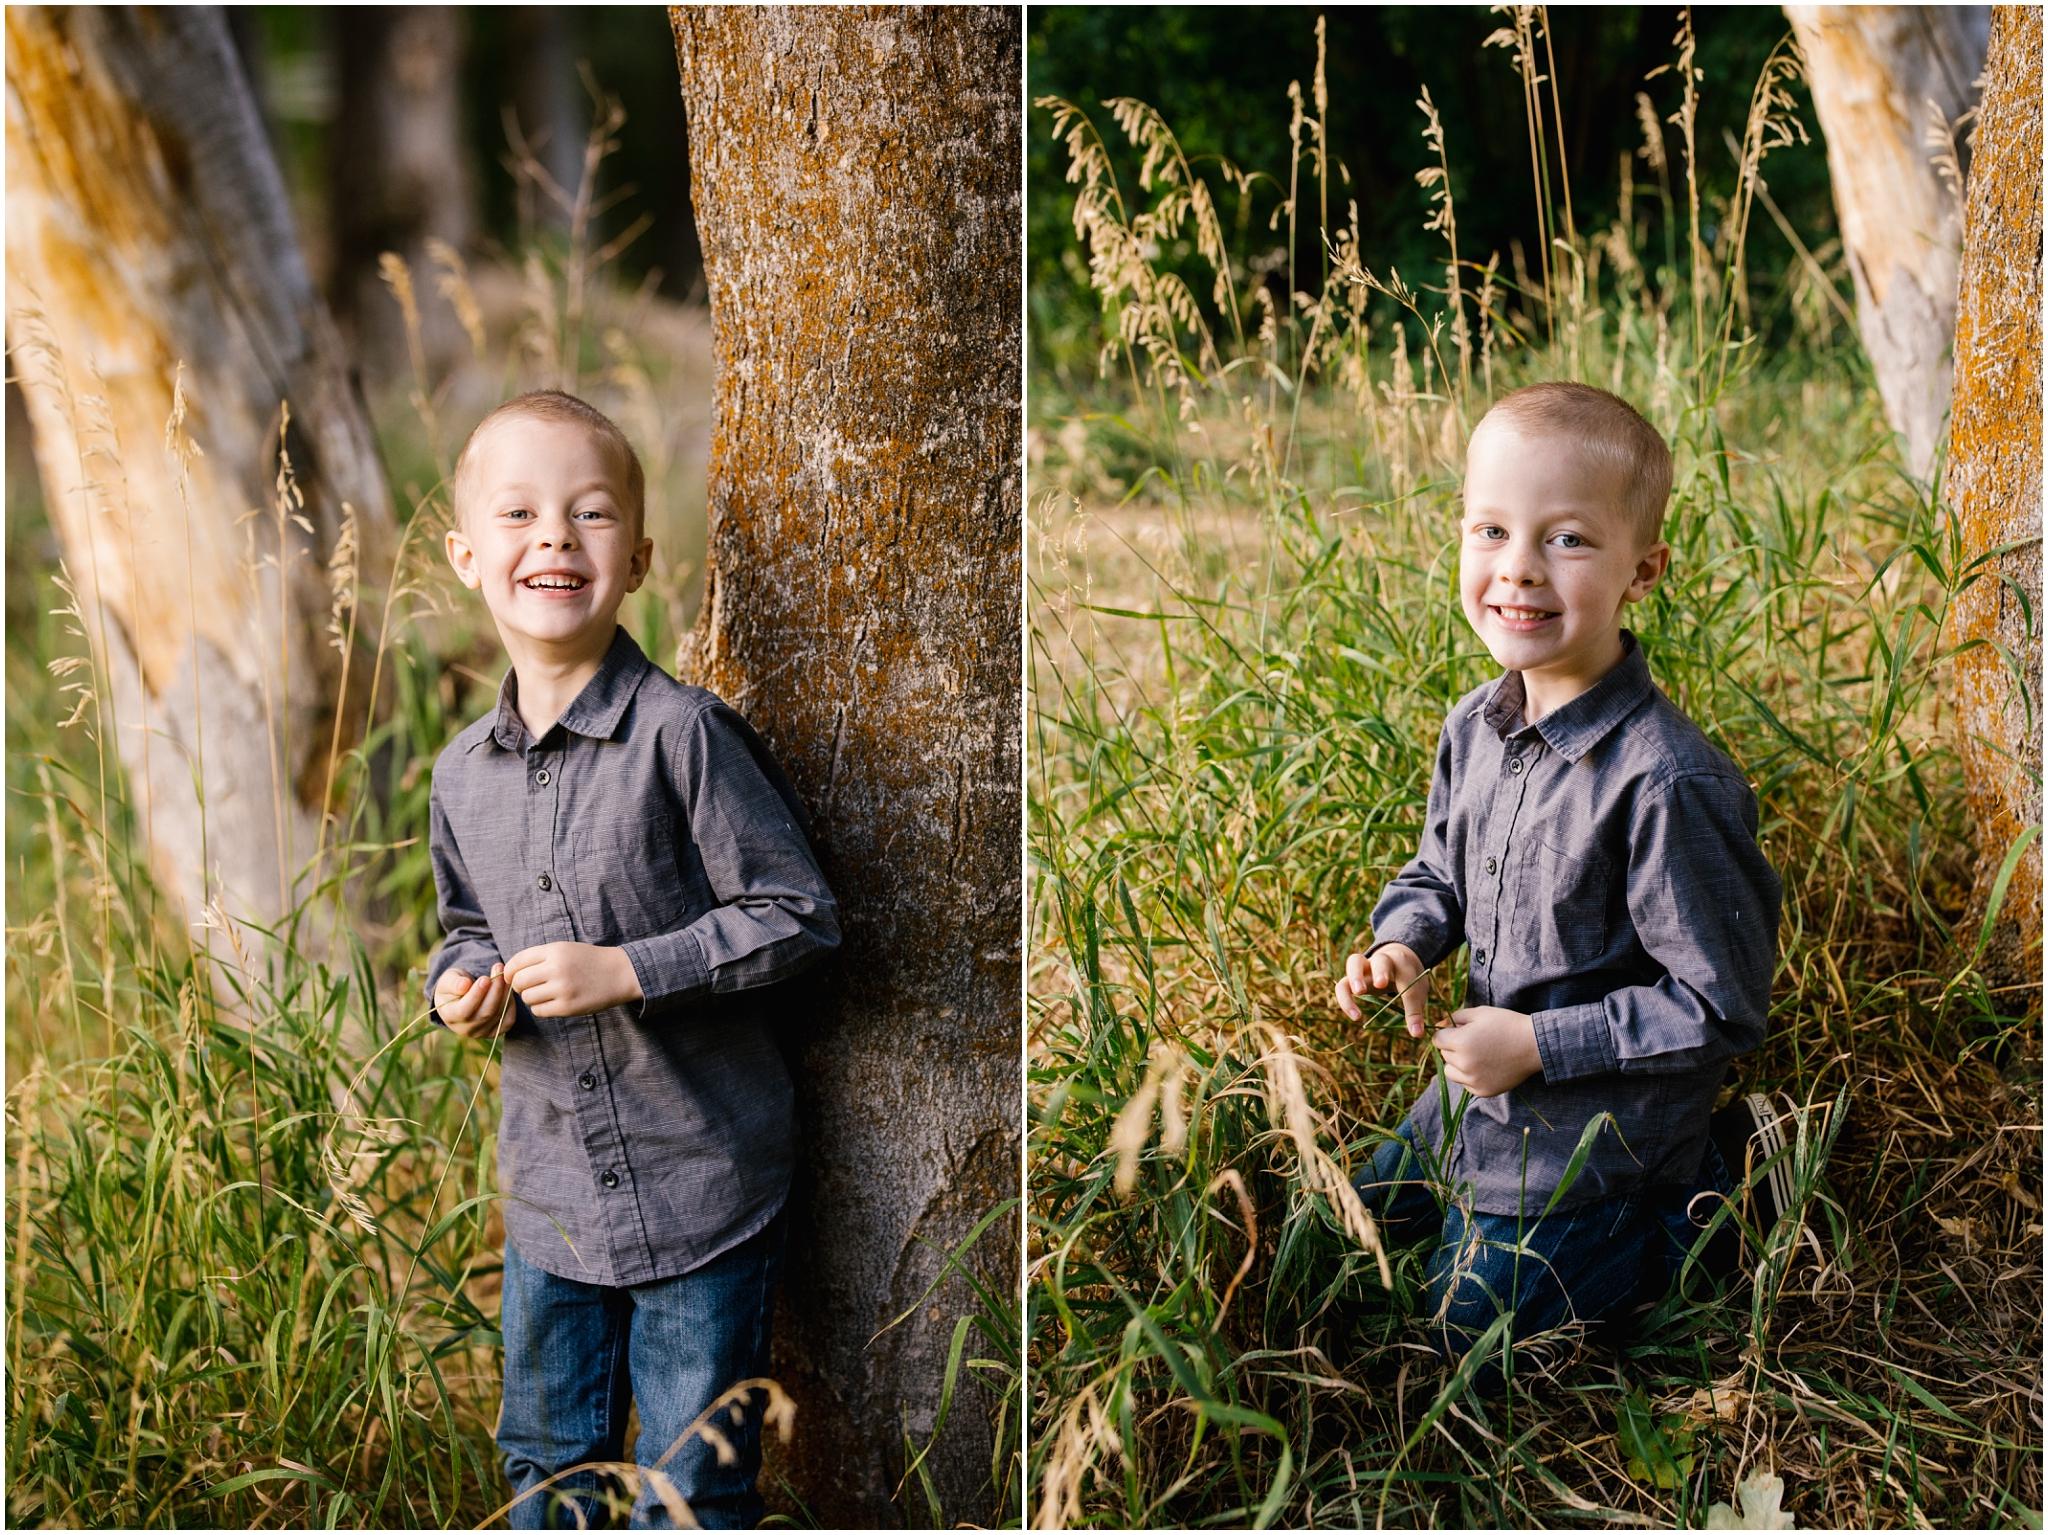 Hurst-16_Lizzie-B-Imagery-Utah-Family-Photographer-Hobble-Creek-Canyon-Jolleys-Ranch-Utah-County.jpg